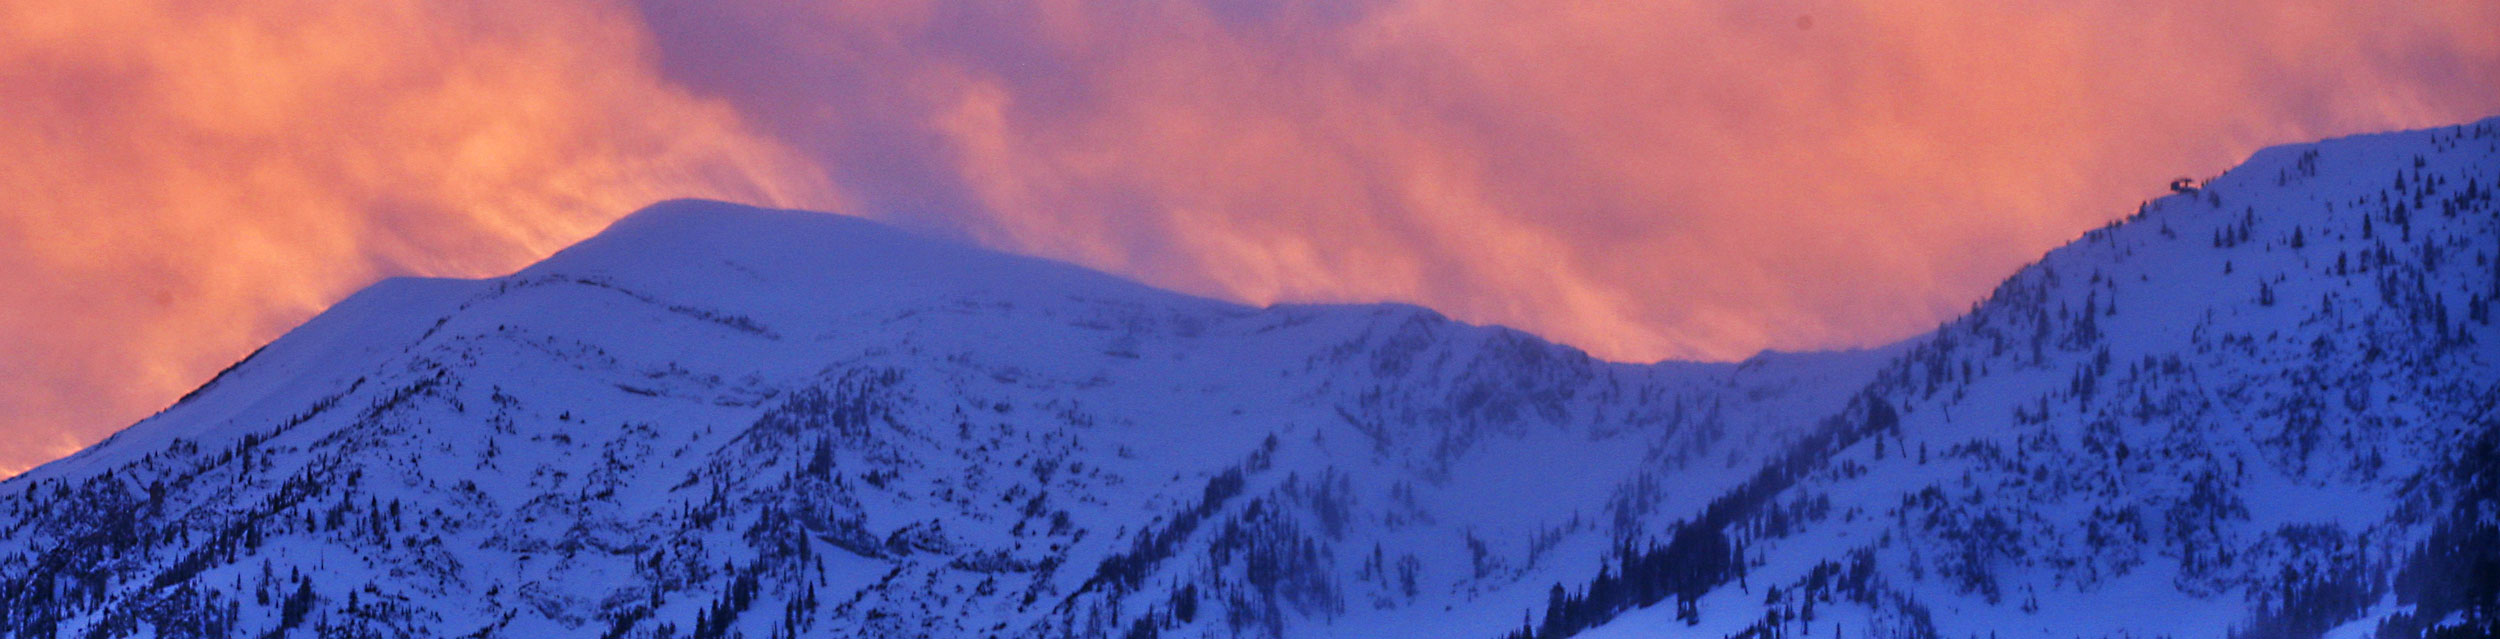 Slushman's and Saddle Peak By Pat Clayton